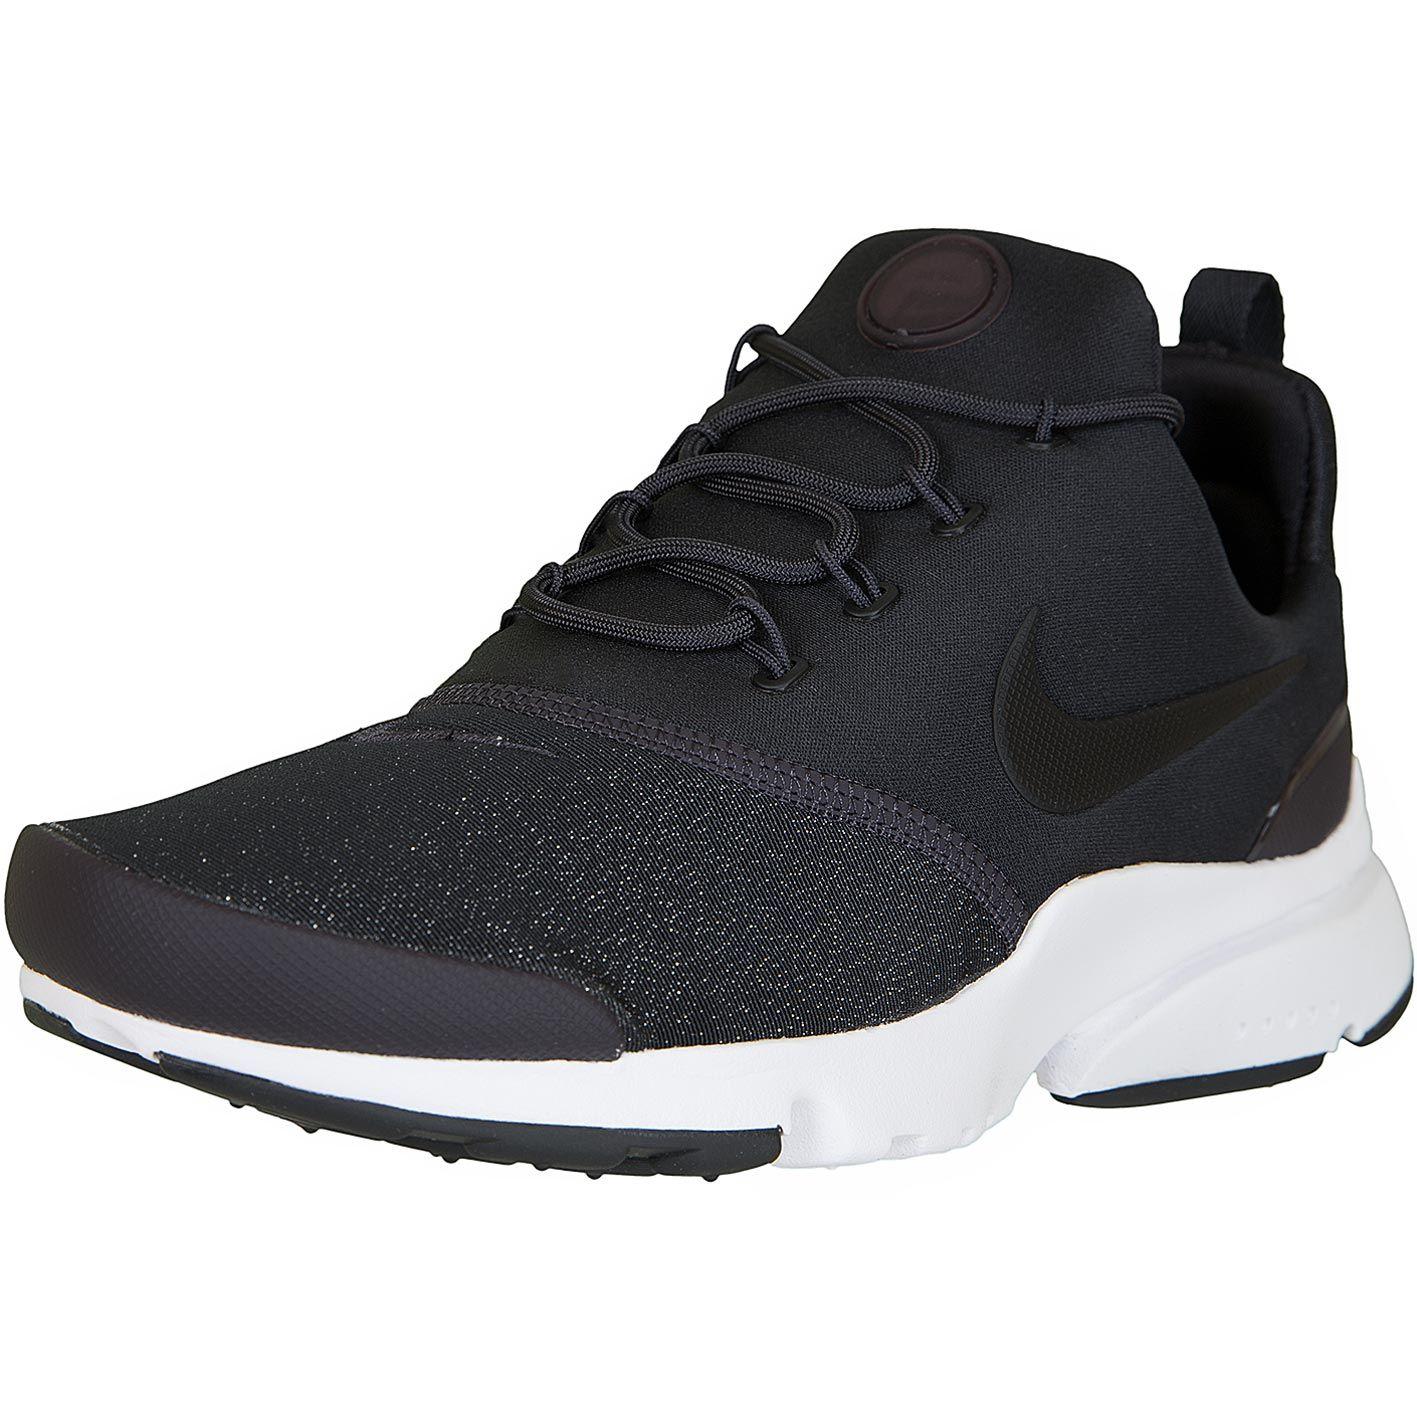 9011e089d1 Nike Damen Sneaker Presto Fly Premium grau/schwarz - hier bestellen!